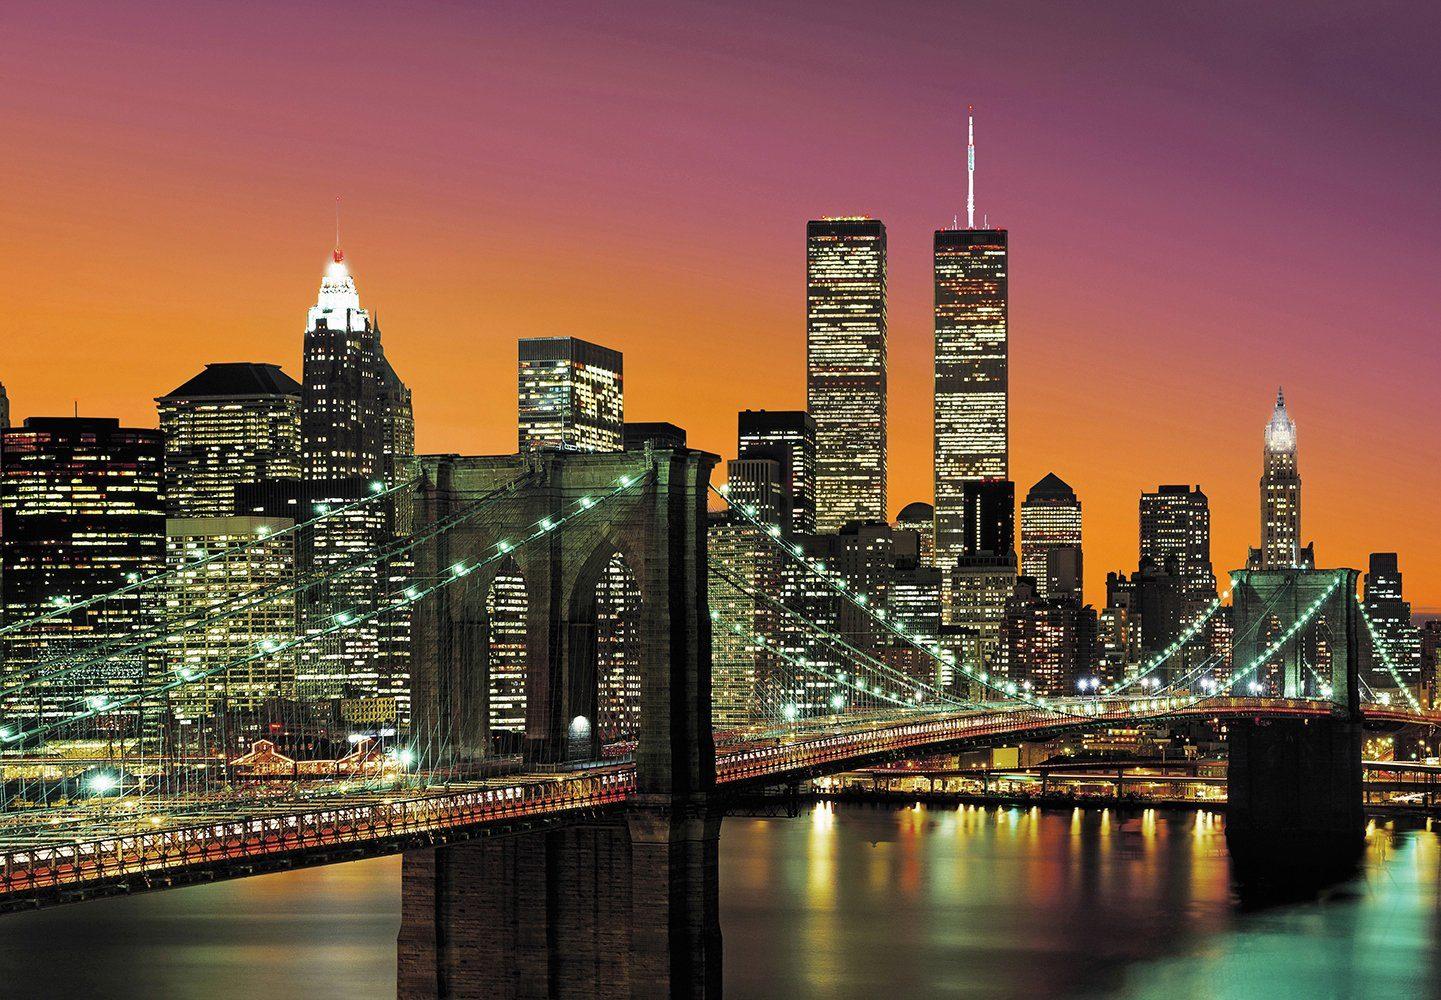 Fototapete »New York City«, 8-teilig, 366x254 cm